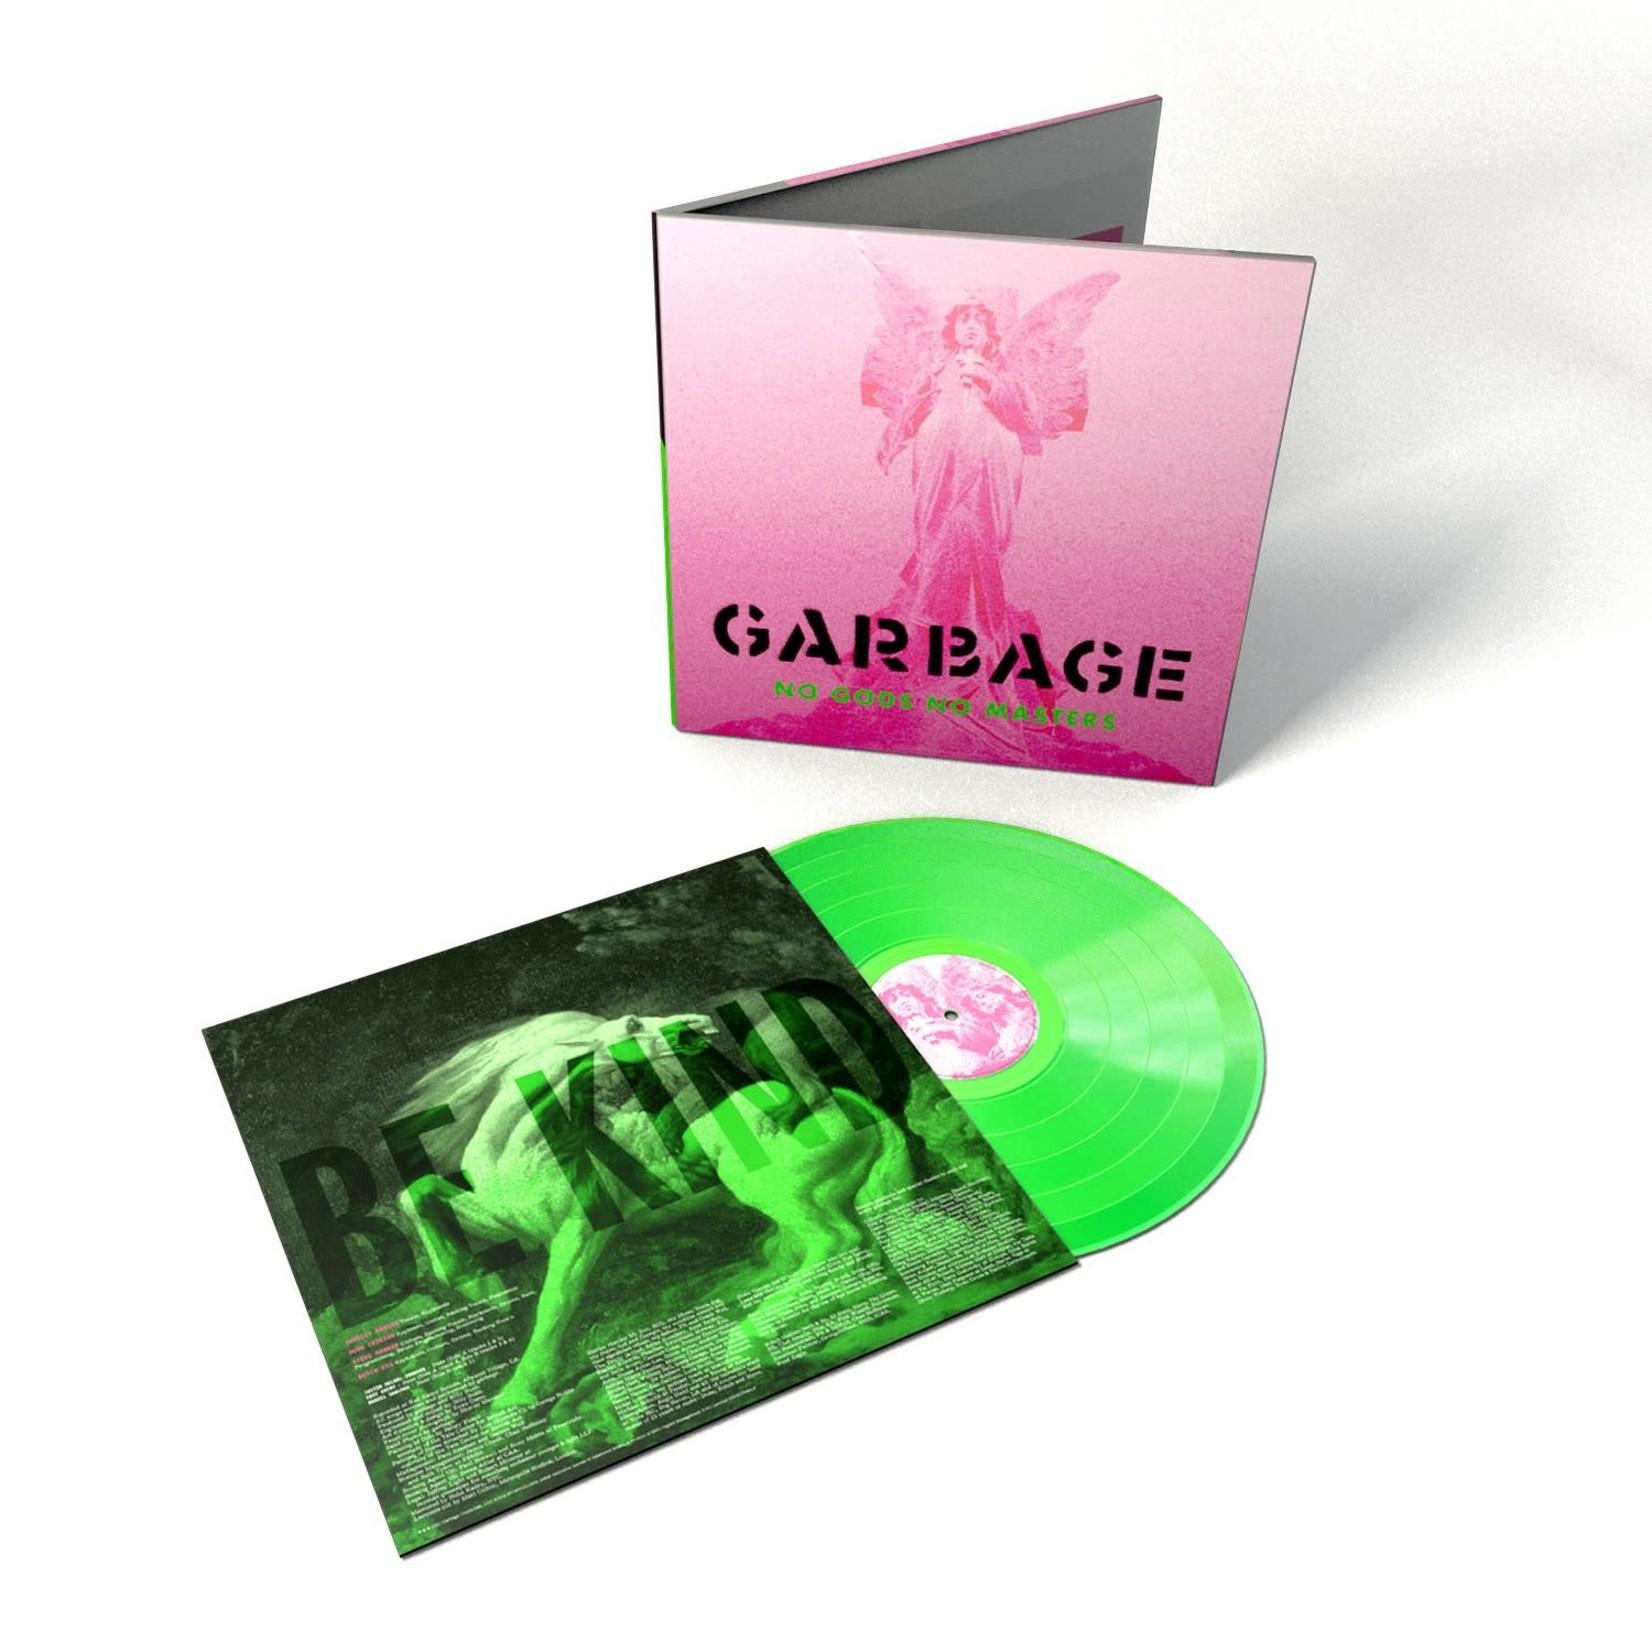 GARBAGE NO GODS NO MASTERS (GREEN LP)